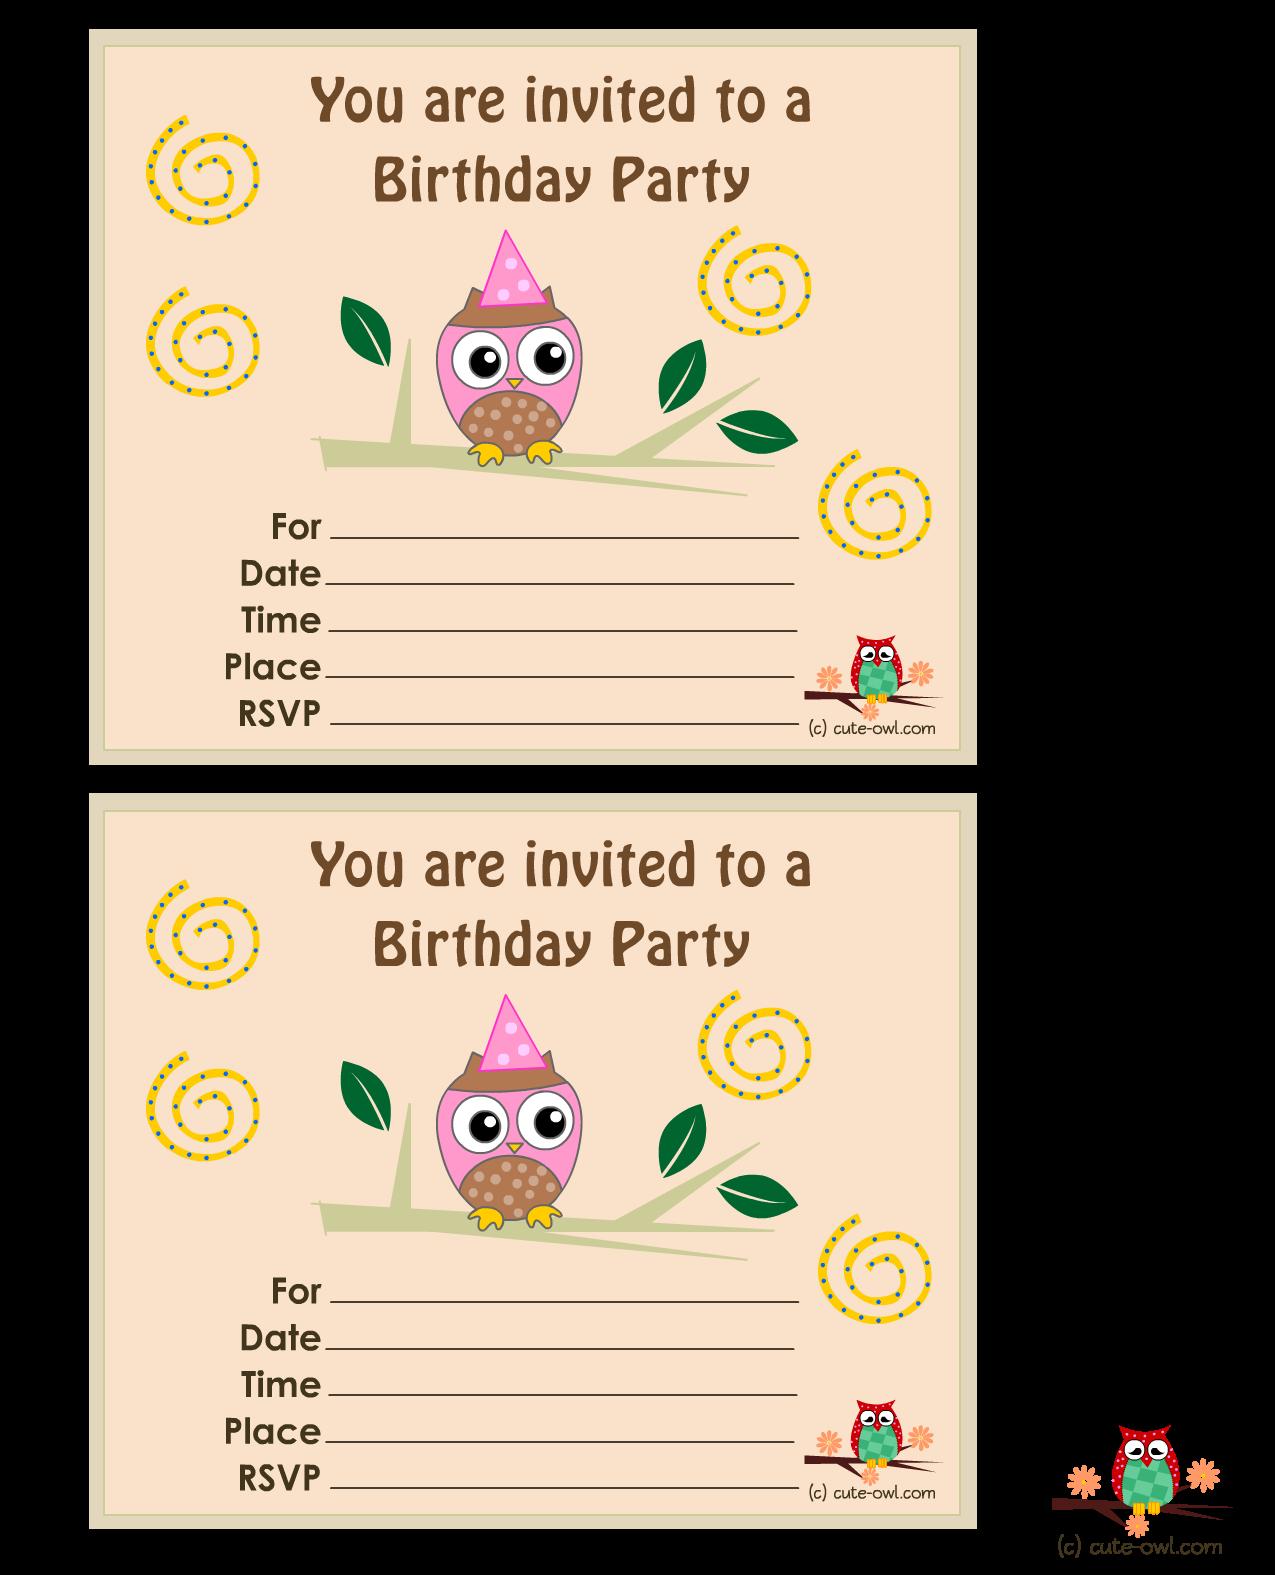 Birthday Party Invitations Printable Free Owl